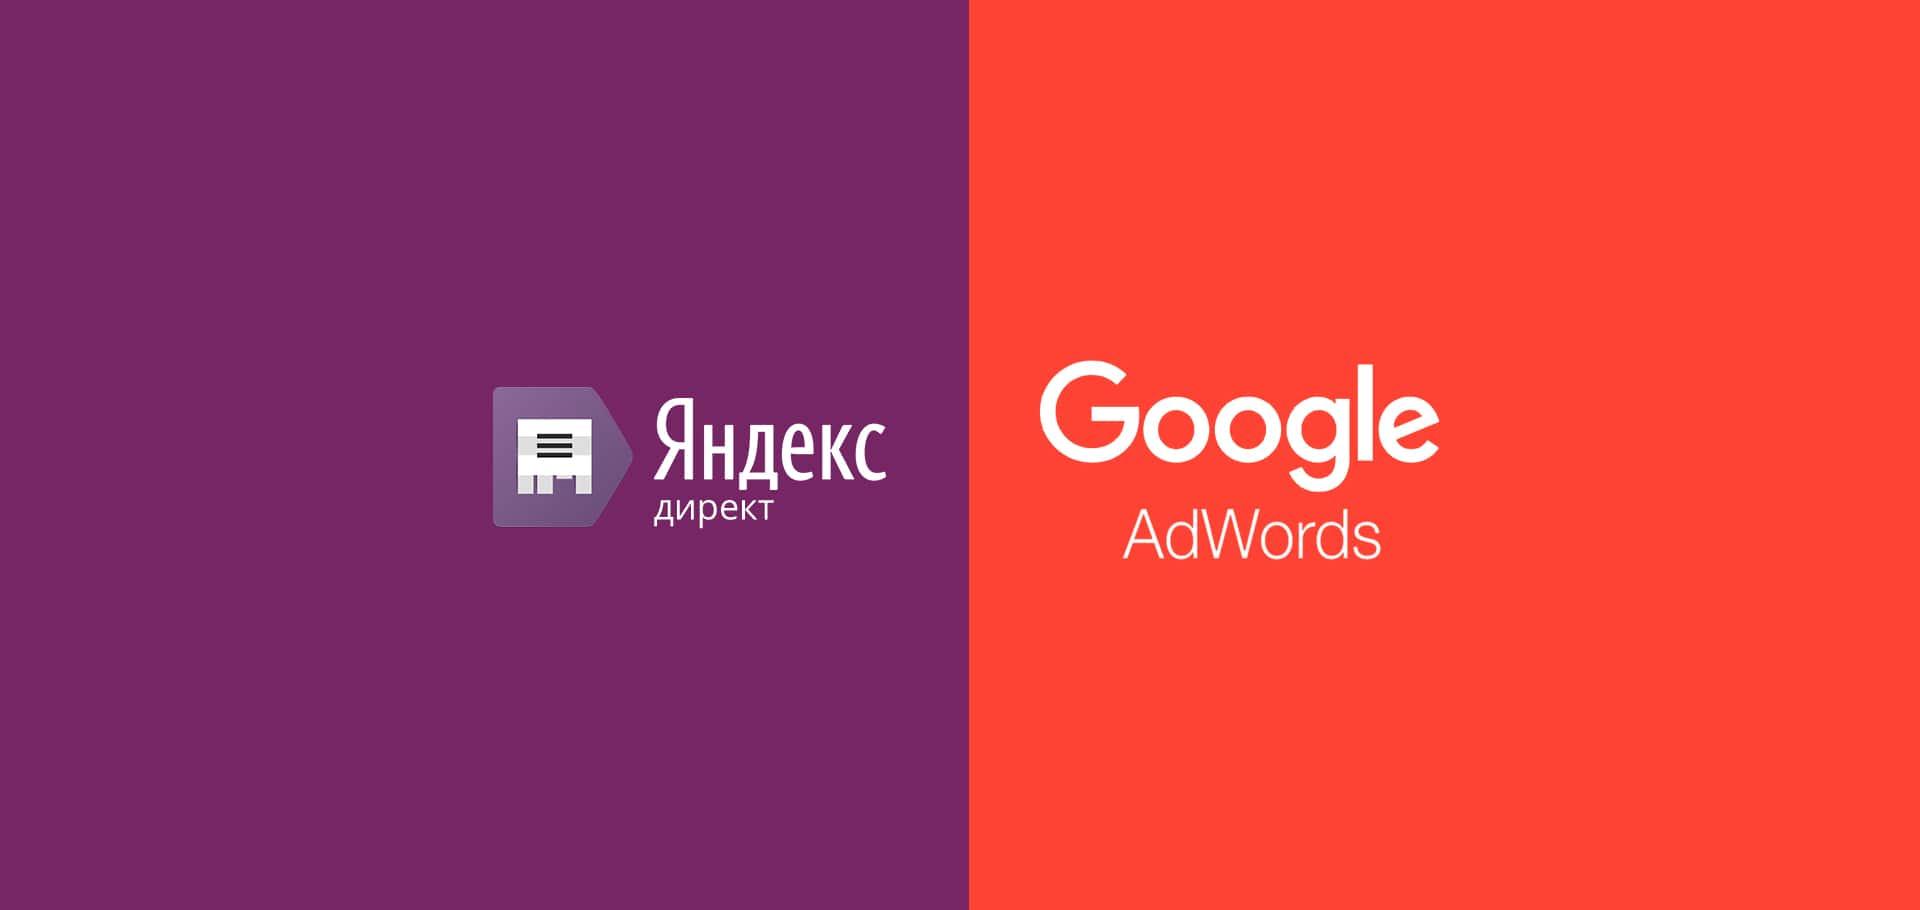 Трафик на Google и Yandex - Продвигаться под Yandex и Google надо по-разному